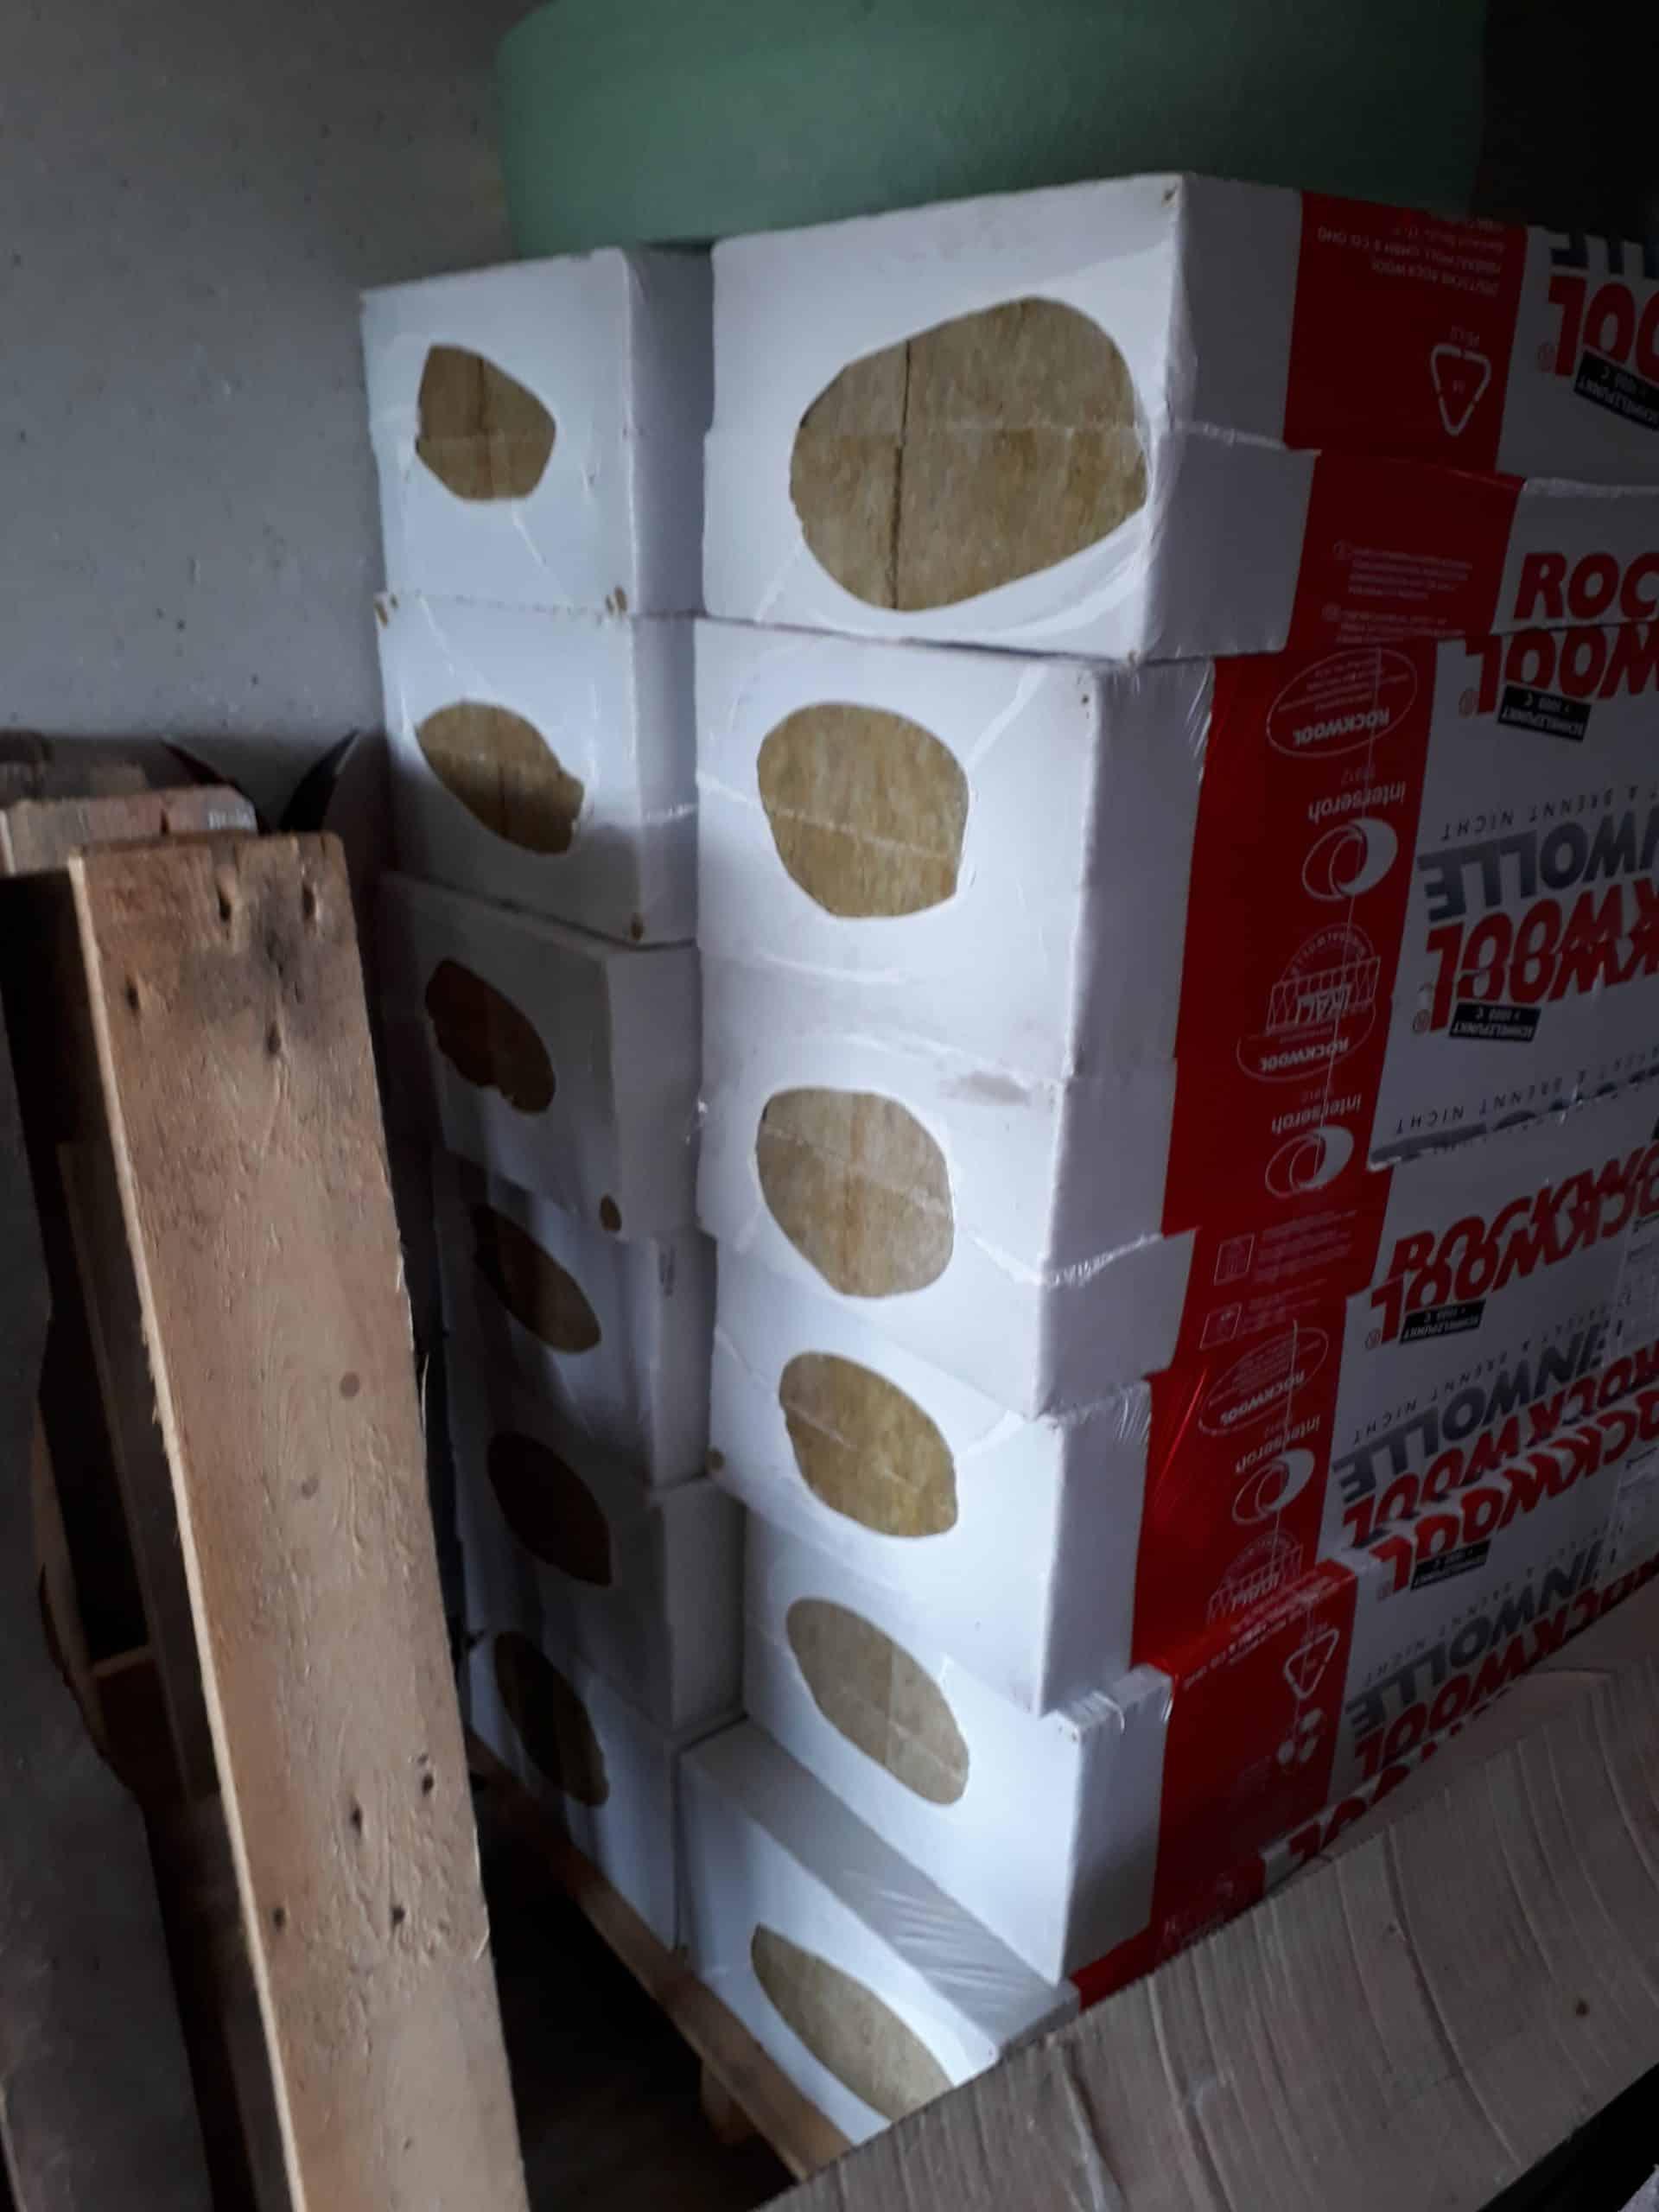 Steinwolle Rockwool Speedrock 2 Putzträgerlamelle 120mm (Paket mit 4 Platten)